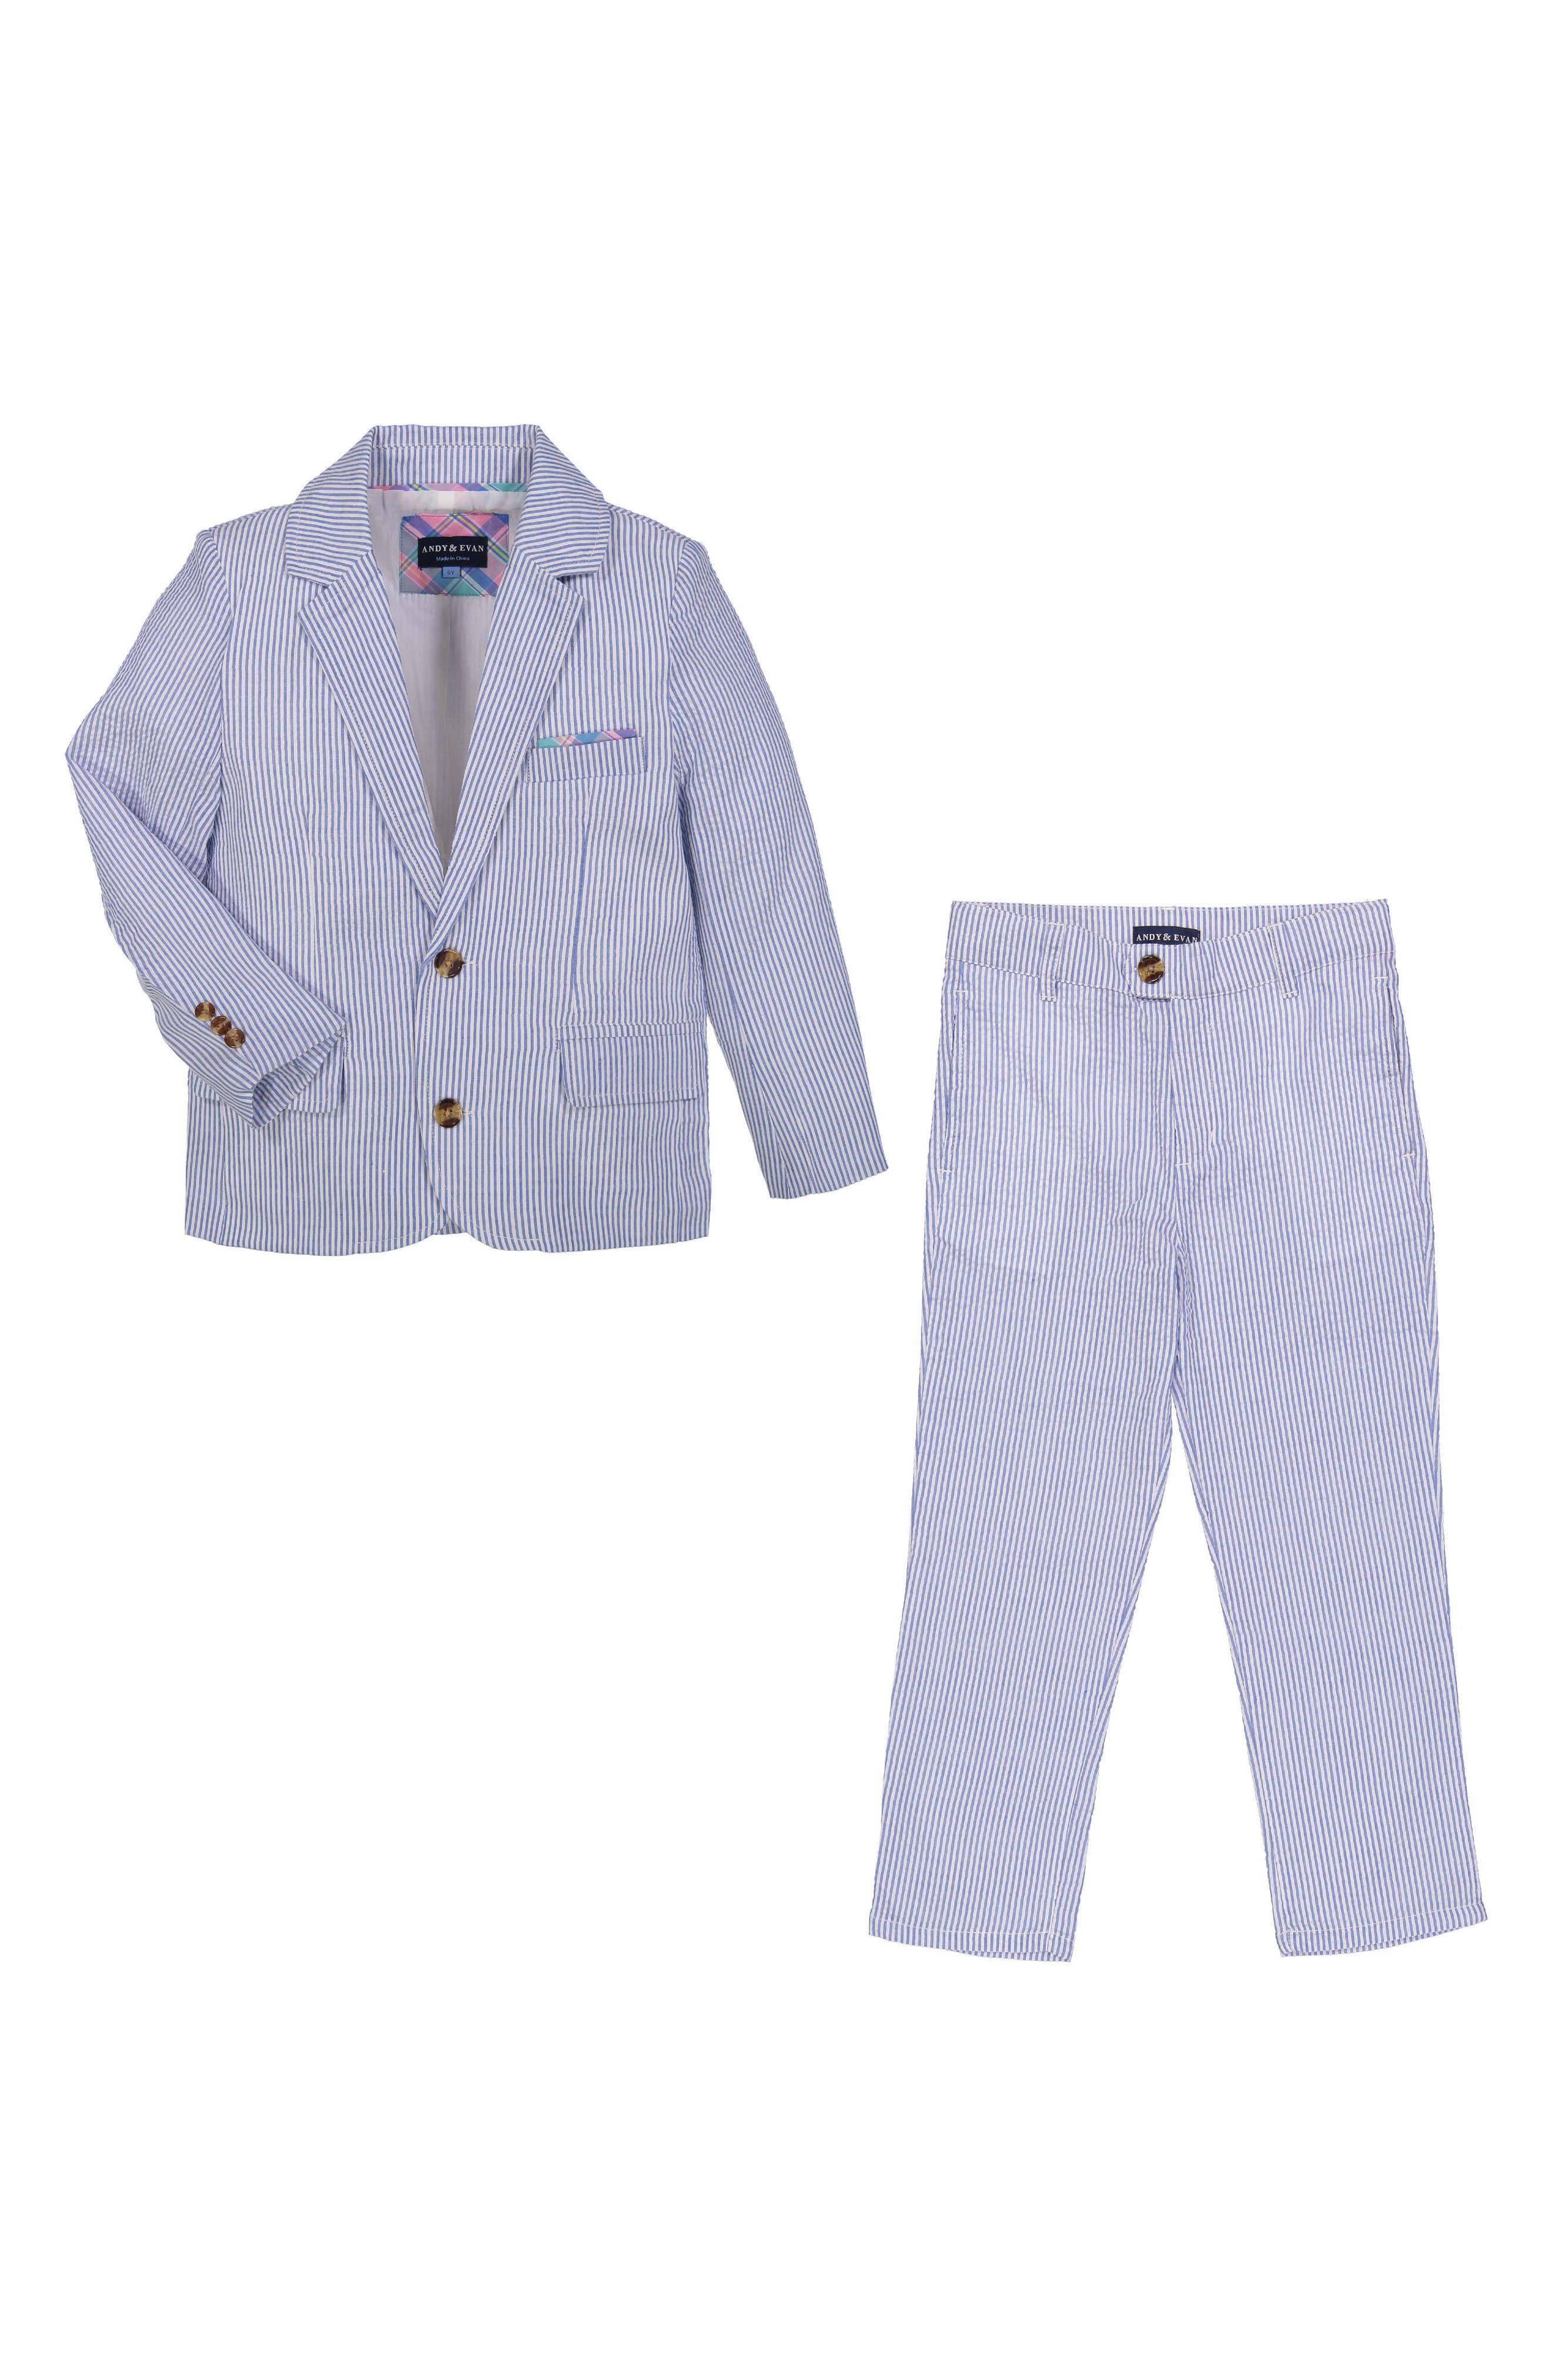 Seersucker Suit Set,                         Main,                         color, Light Blue